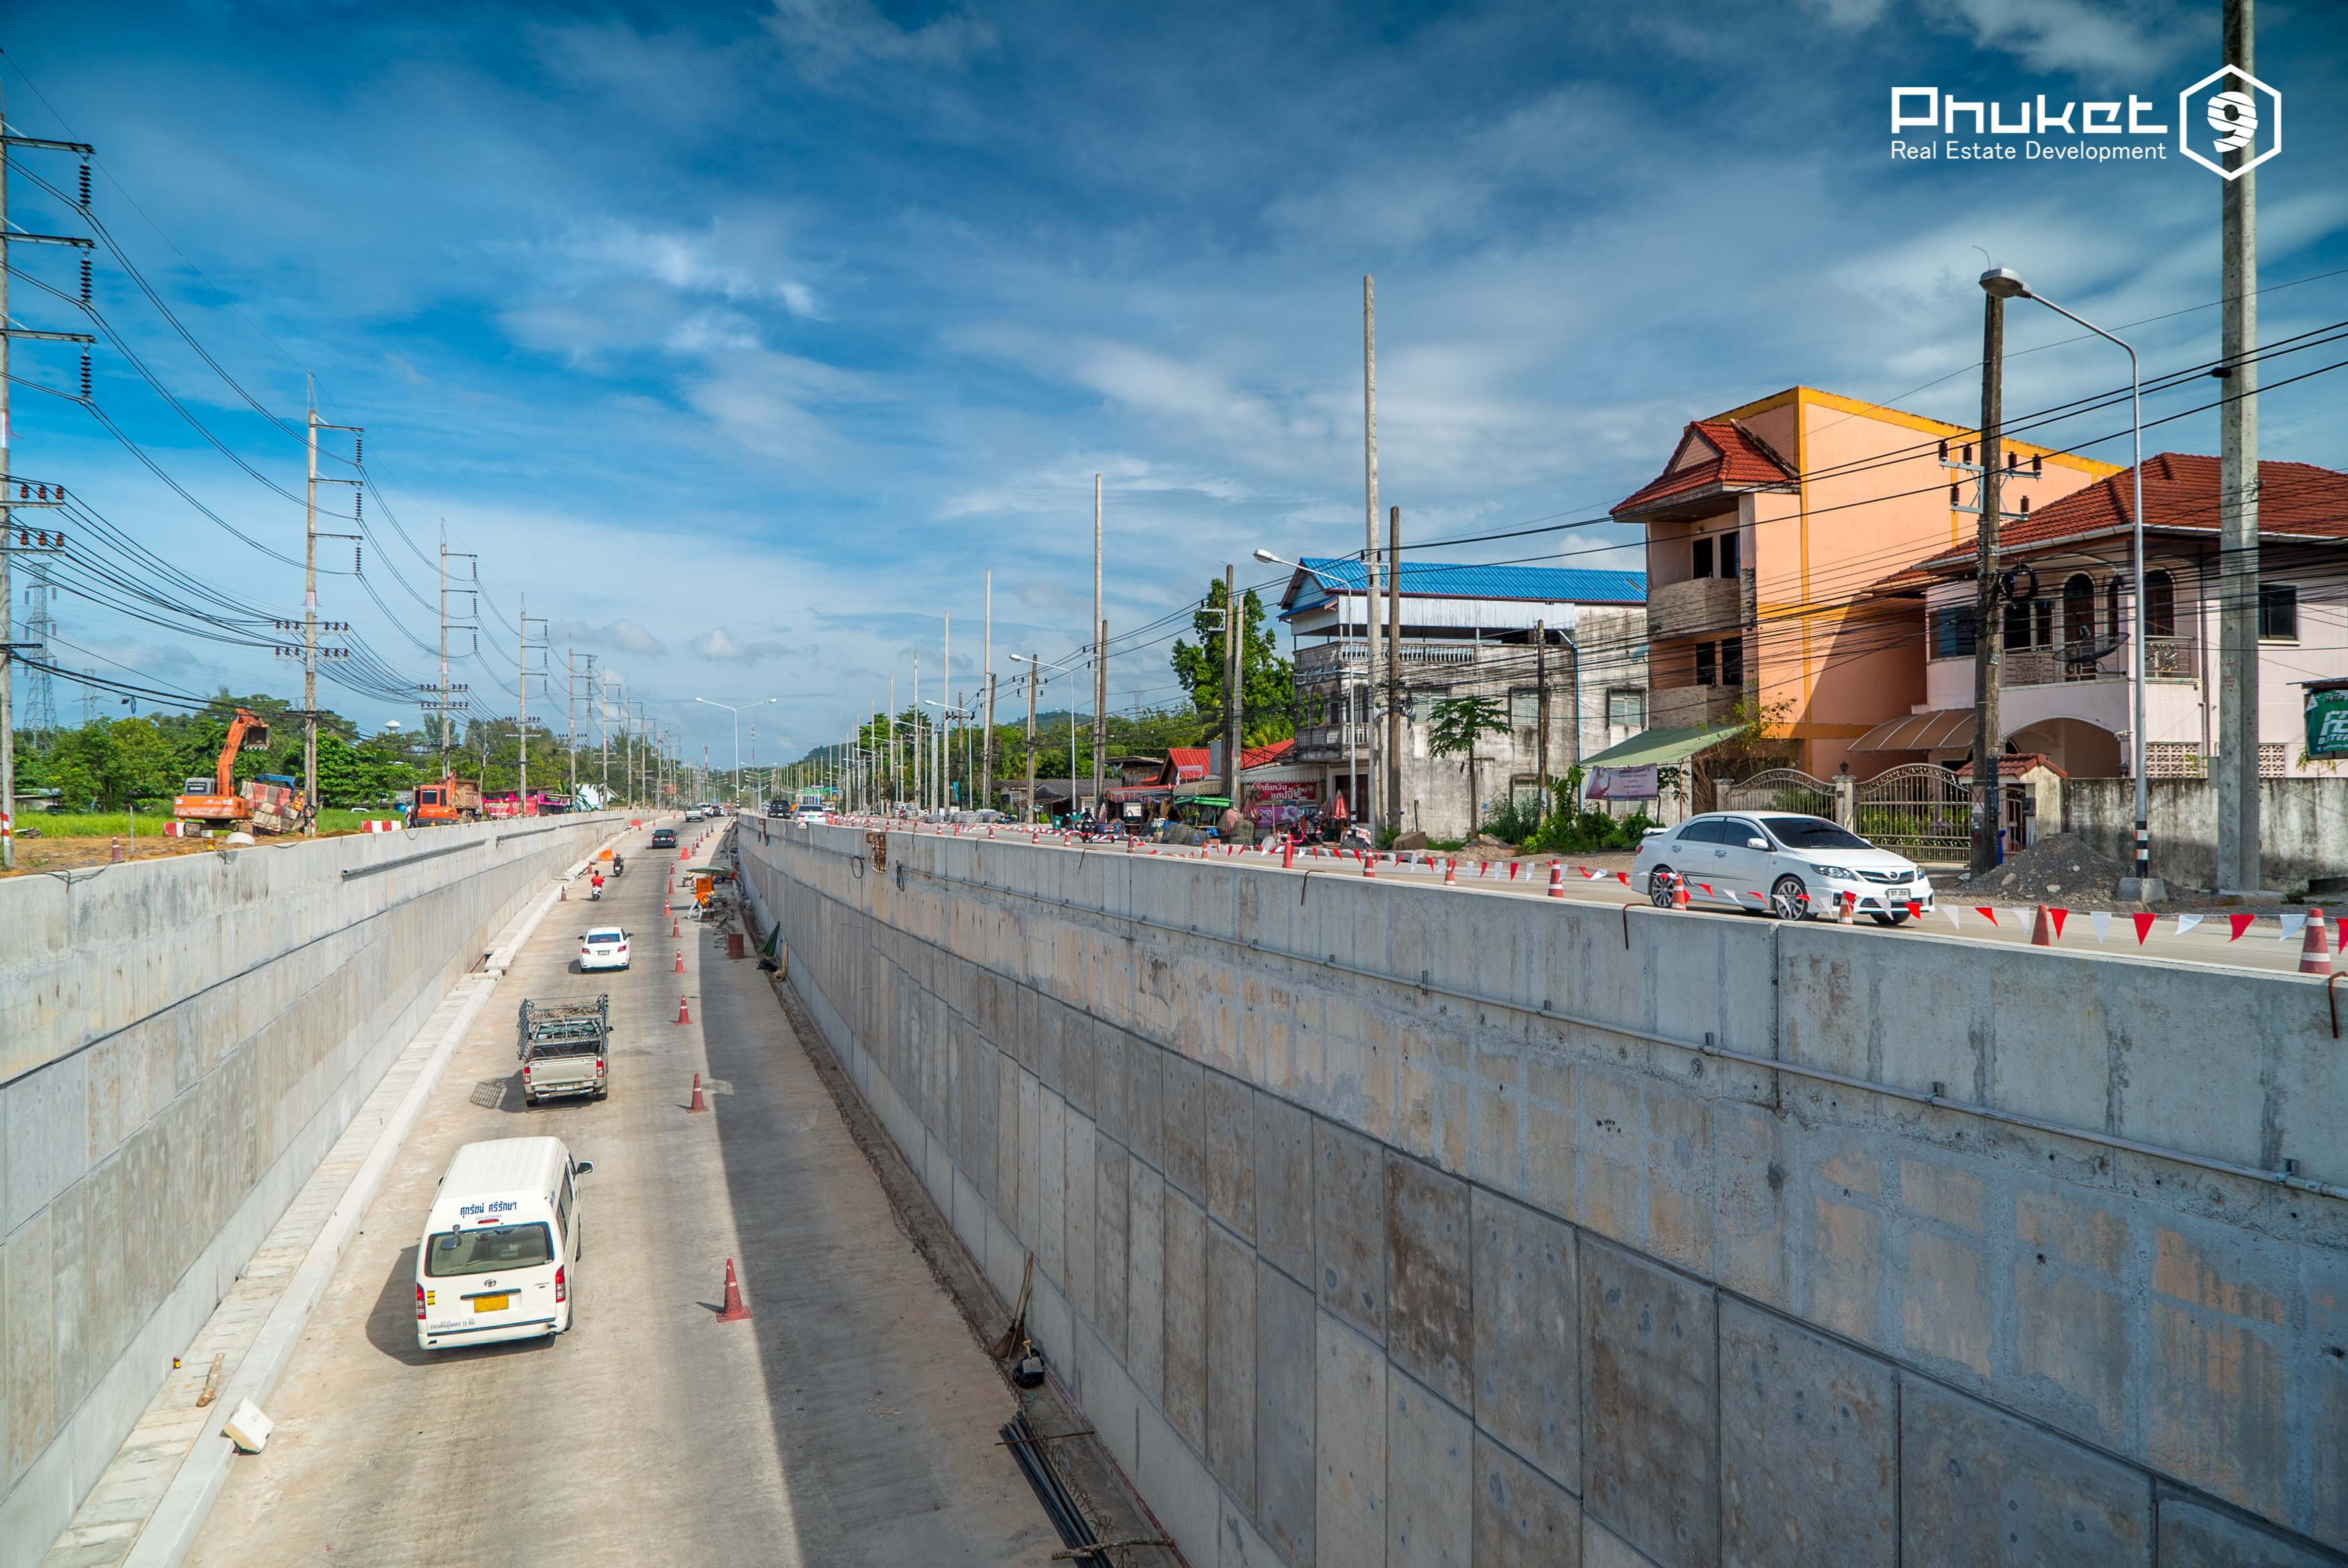 phuket tunnel airport